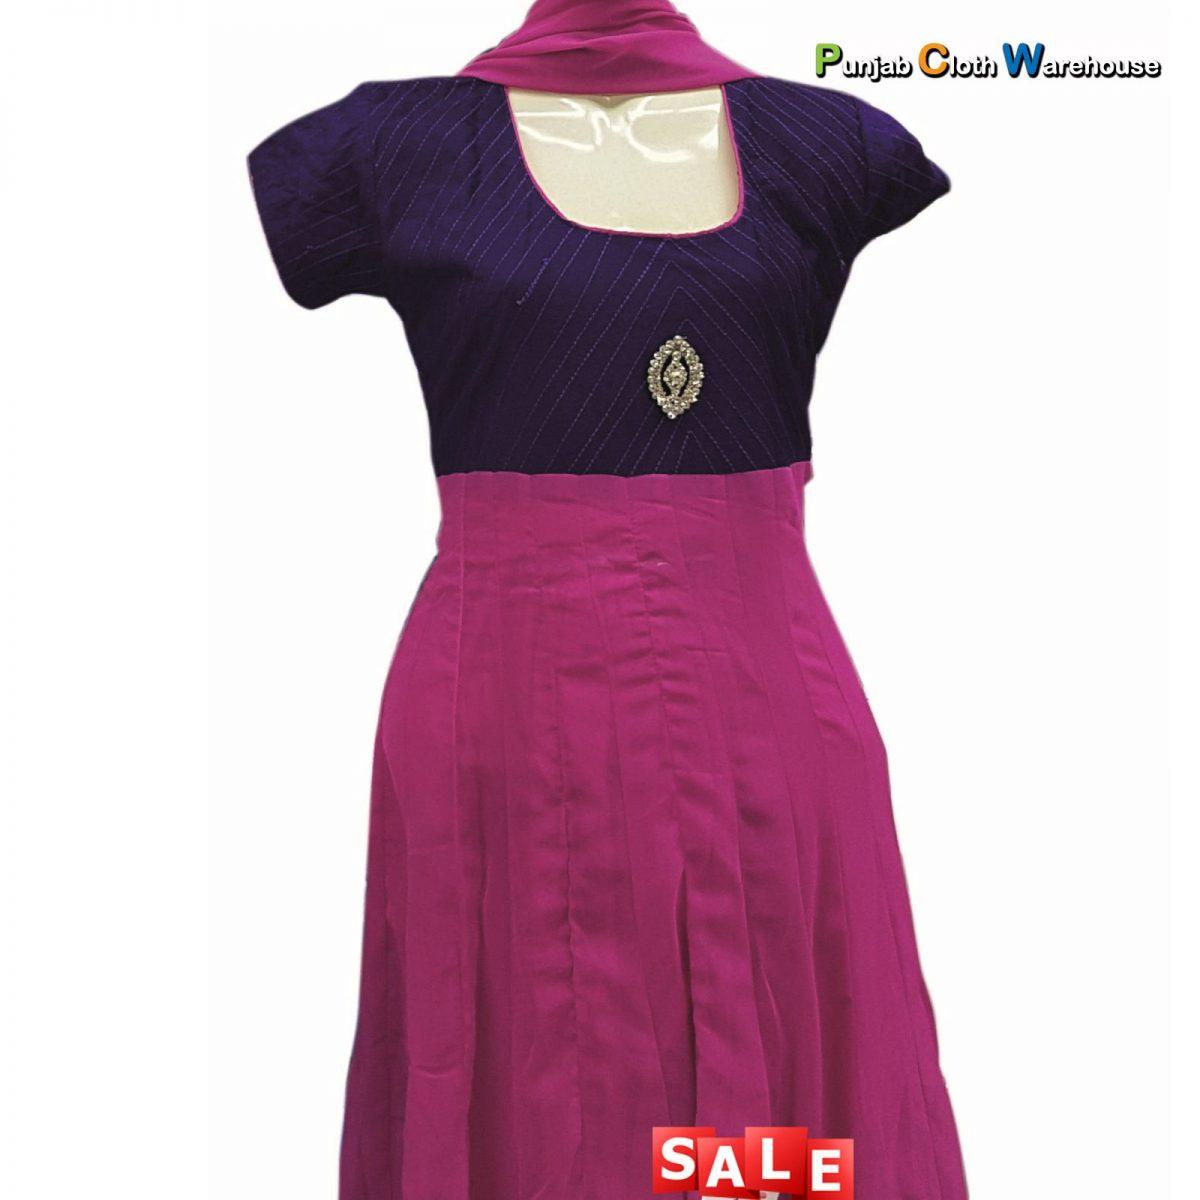 Designer Party Wear Suits, Sarees, Lehengas & Sherwanis (7)